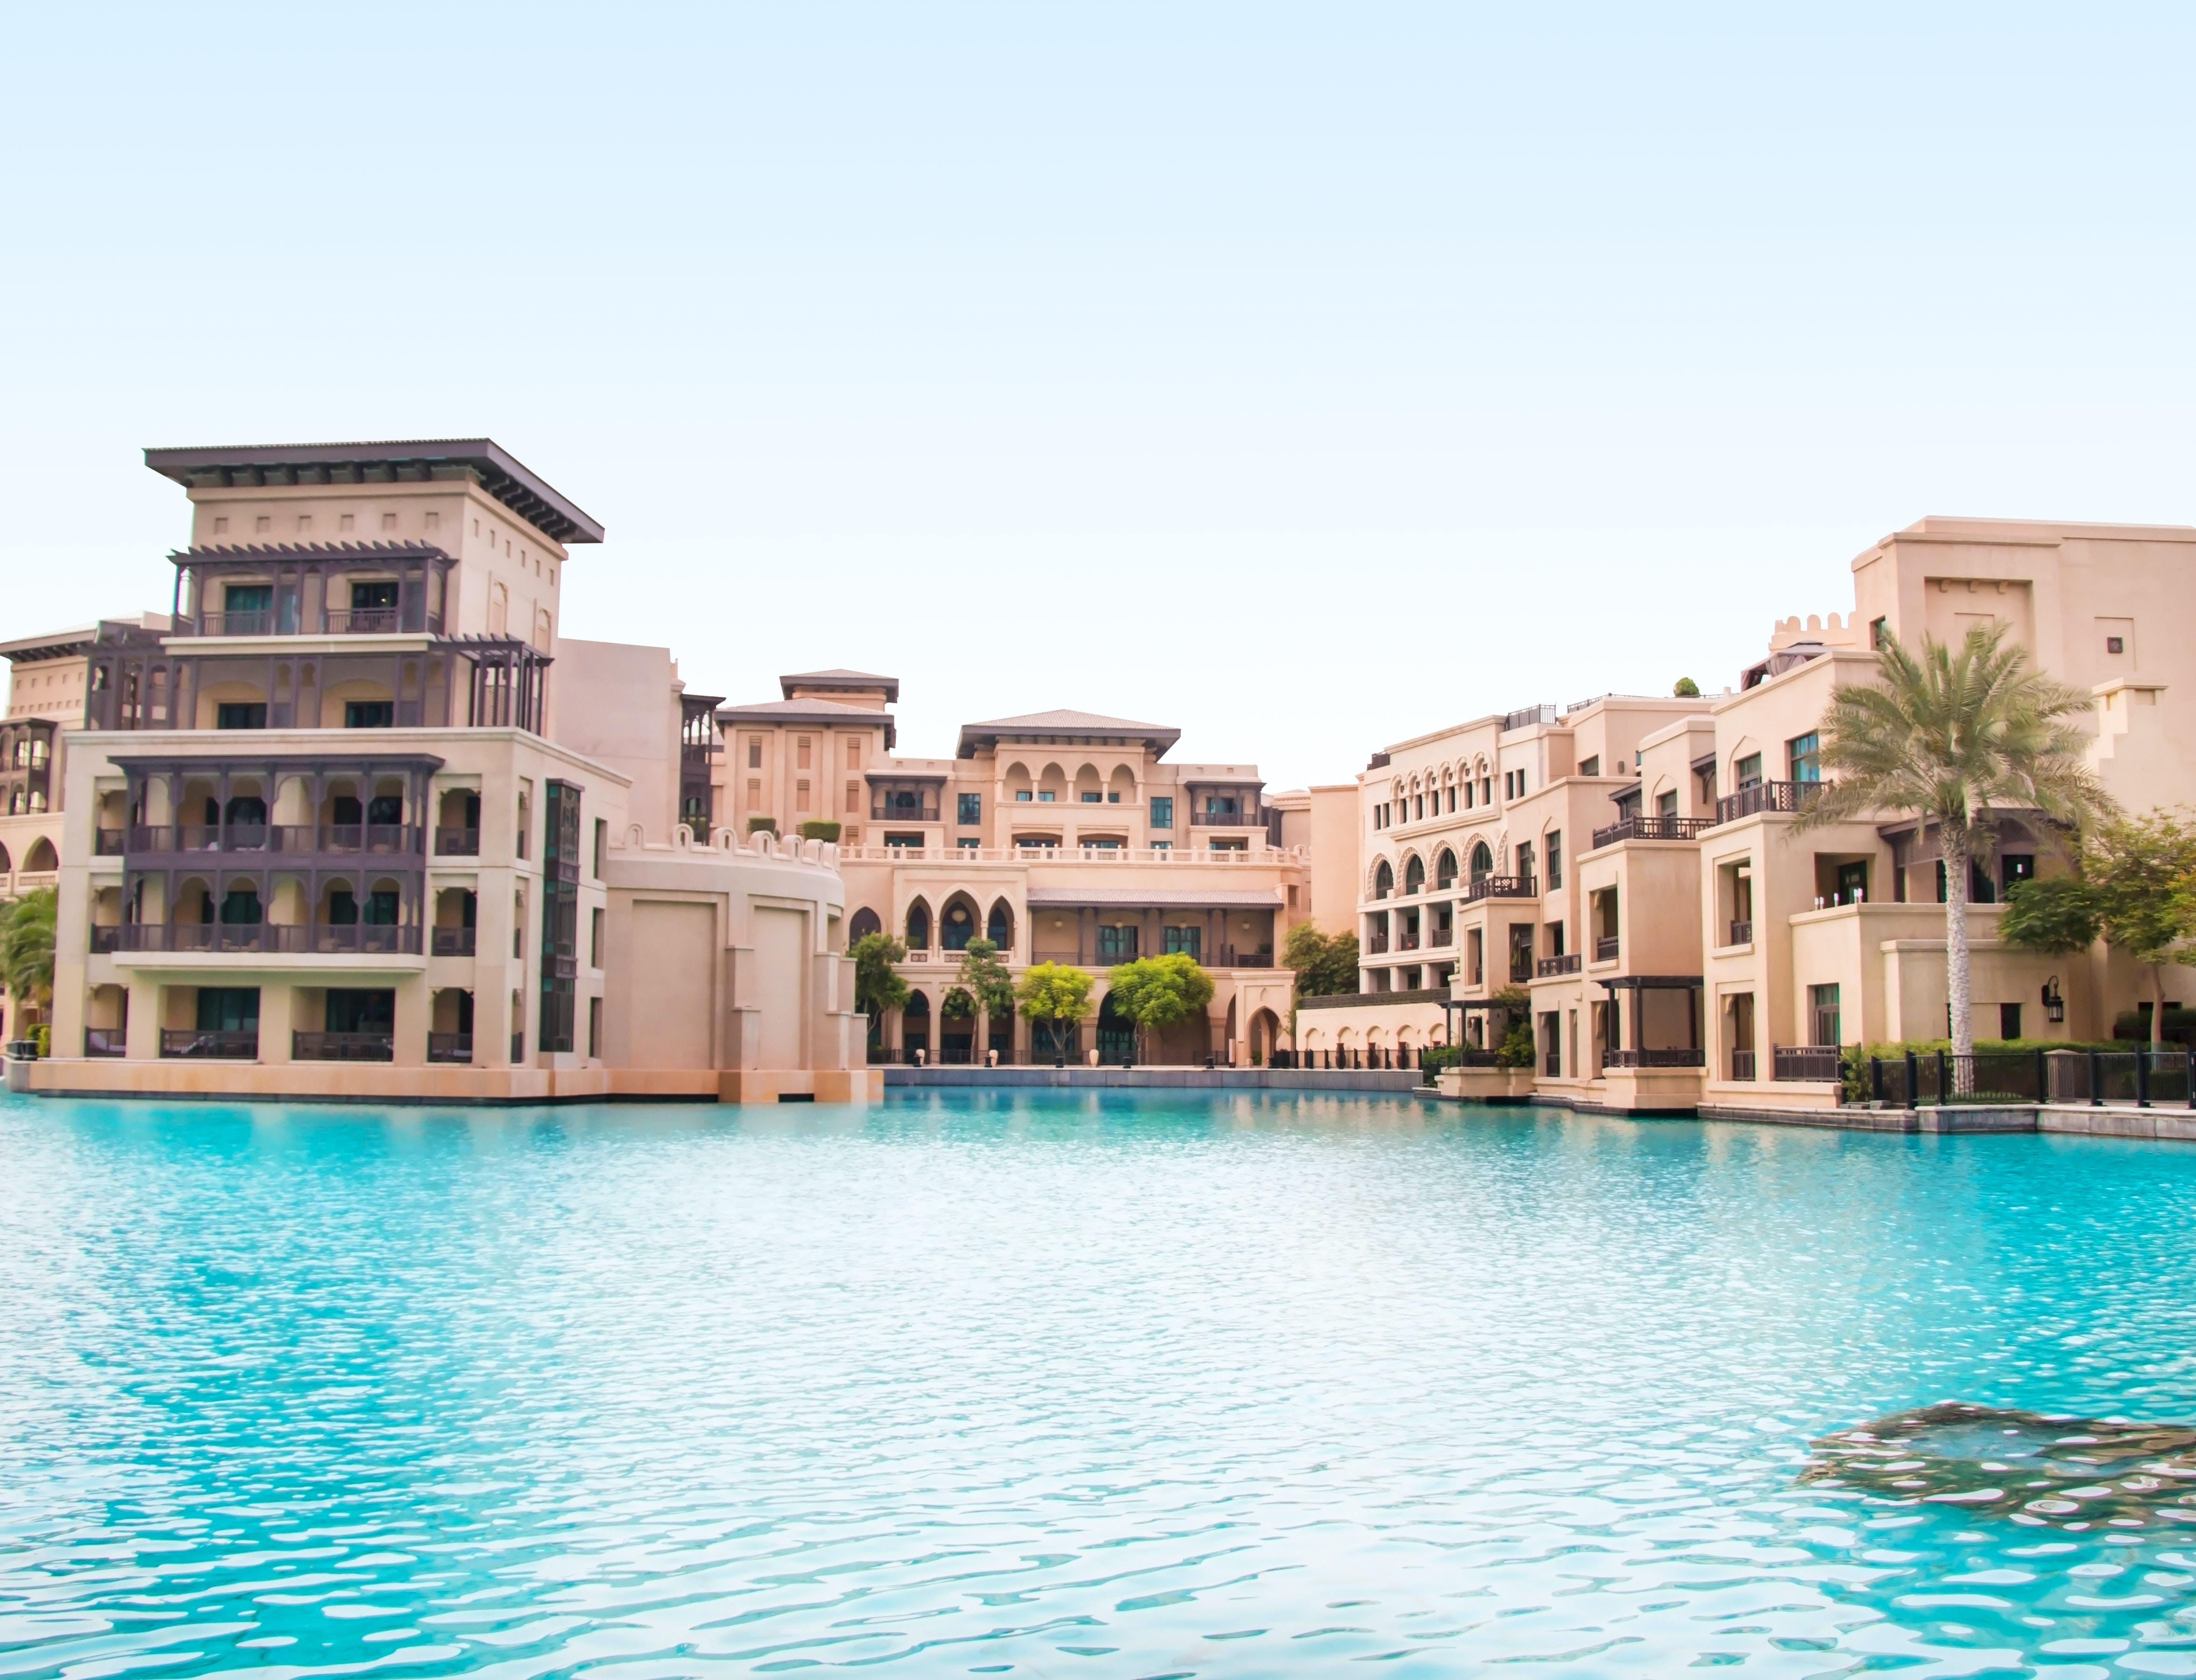 Middle-Eastern resort